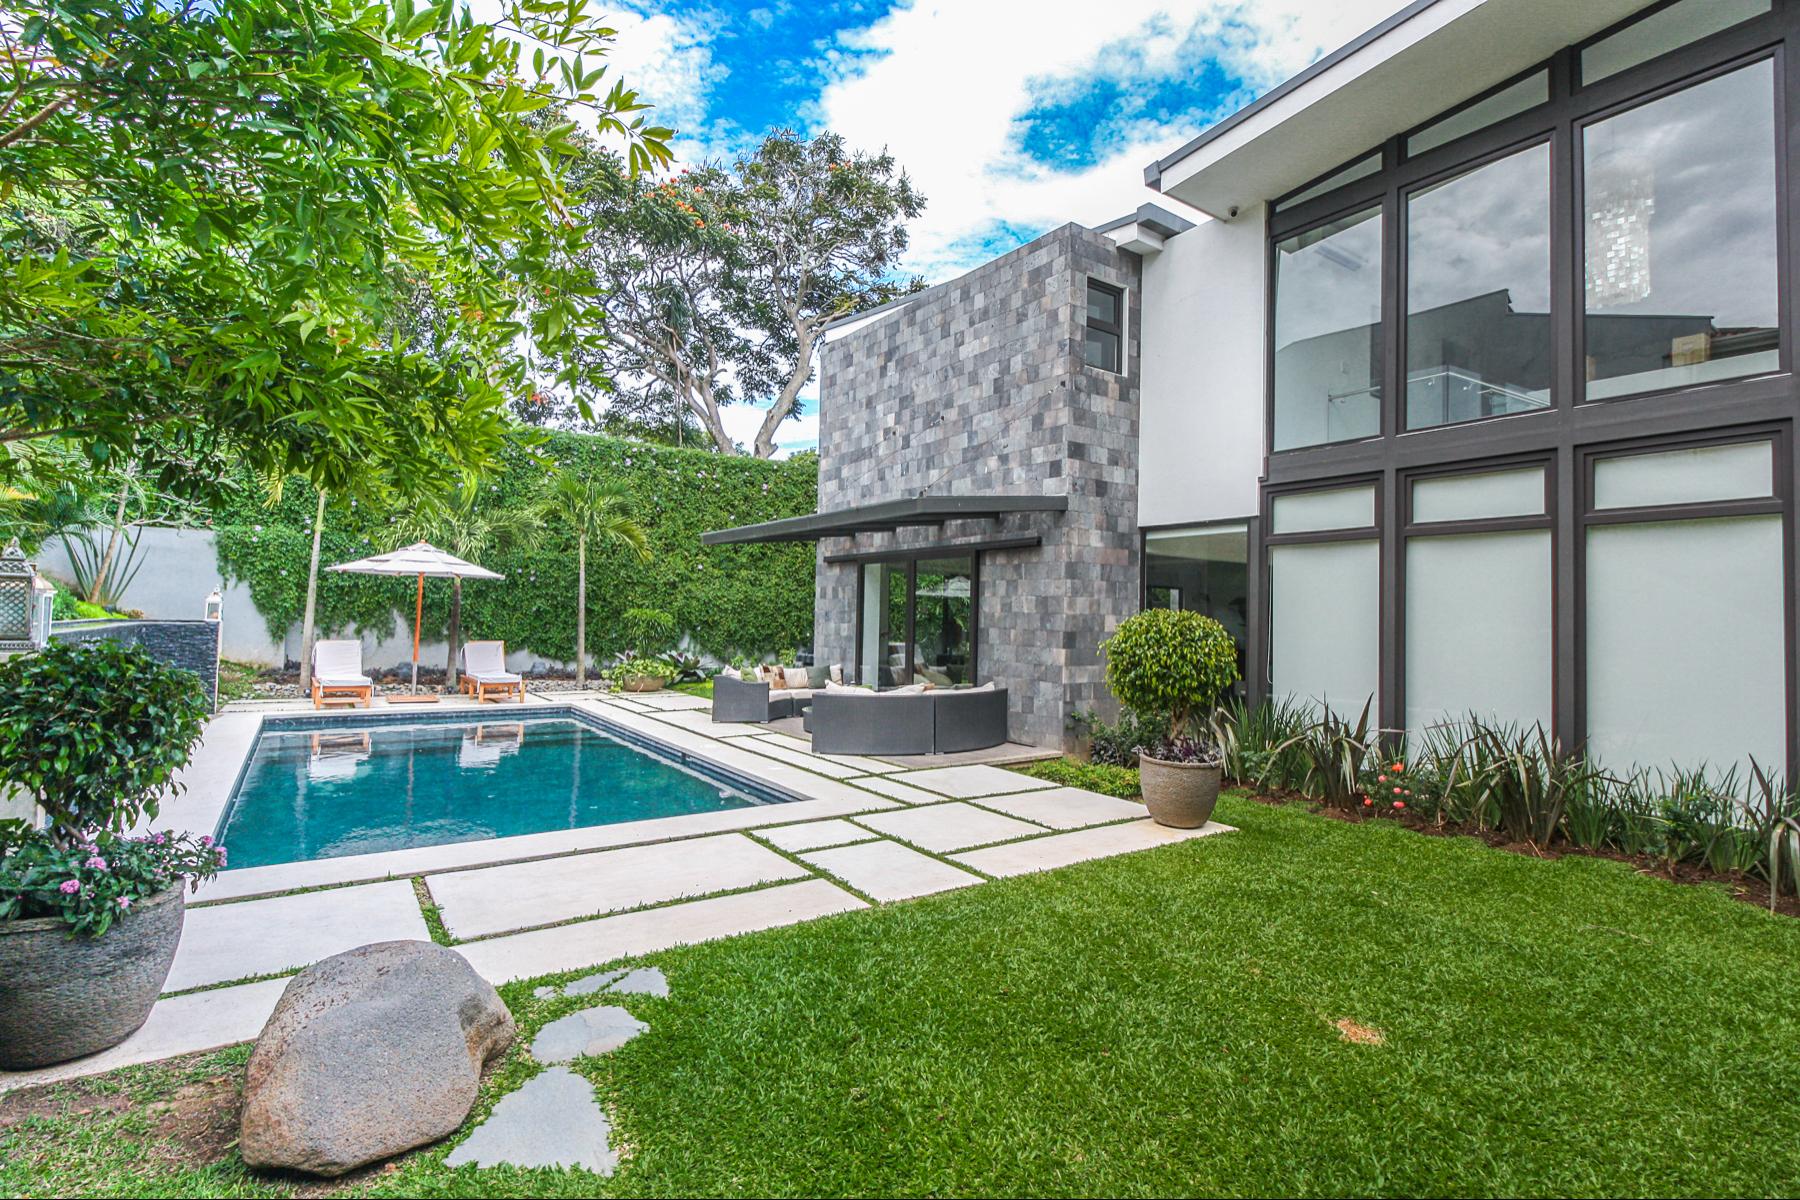 Single Family Homes for Sale at Grey Stone Laureles Escazu, San Jose Costa Rica